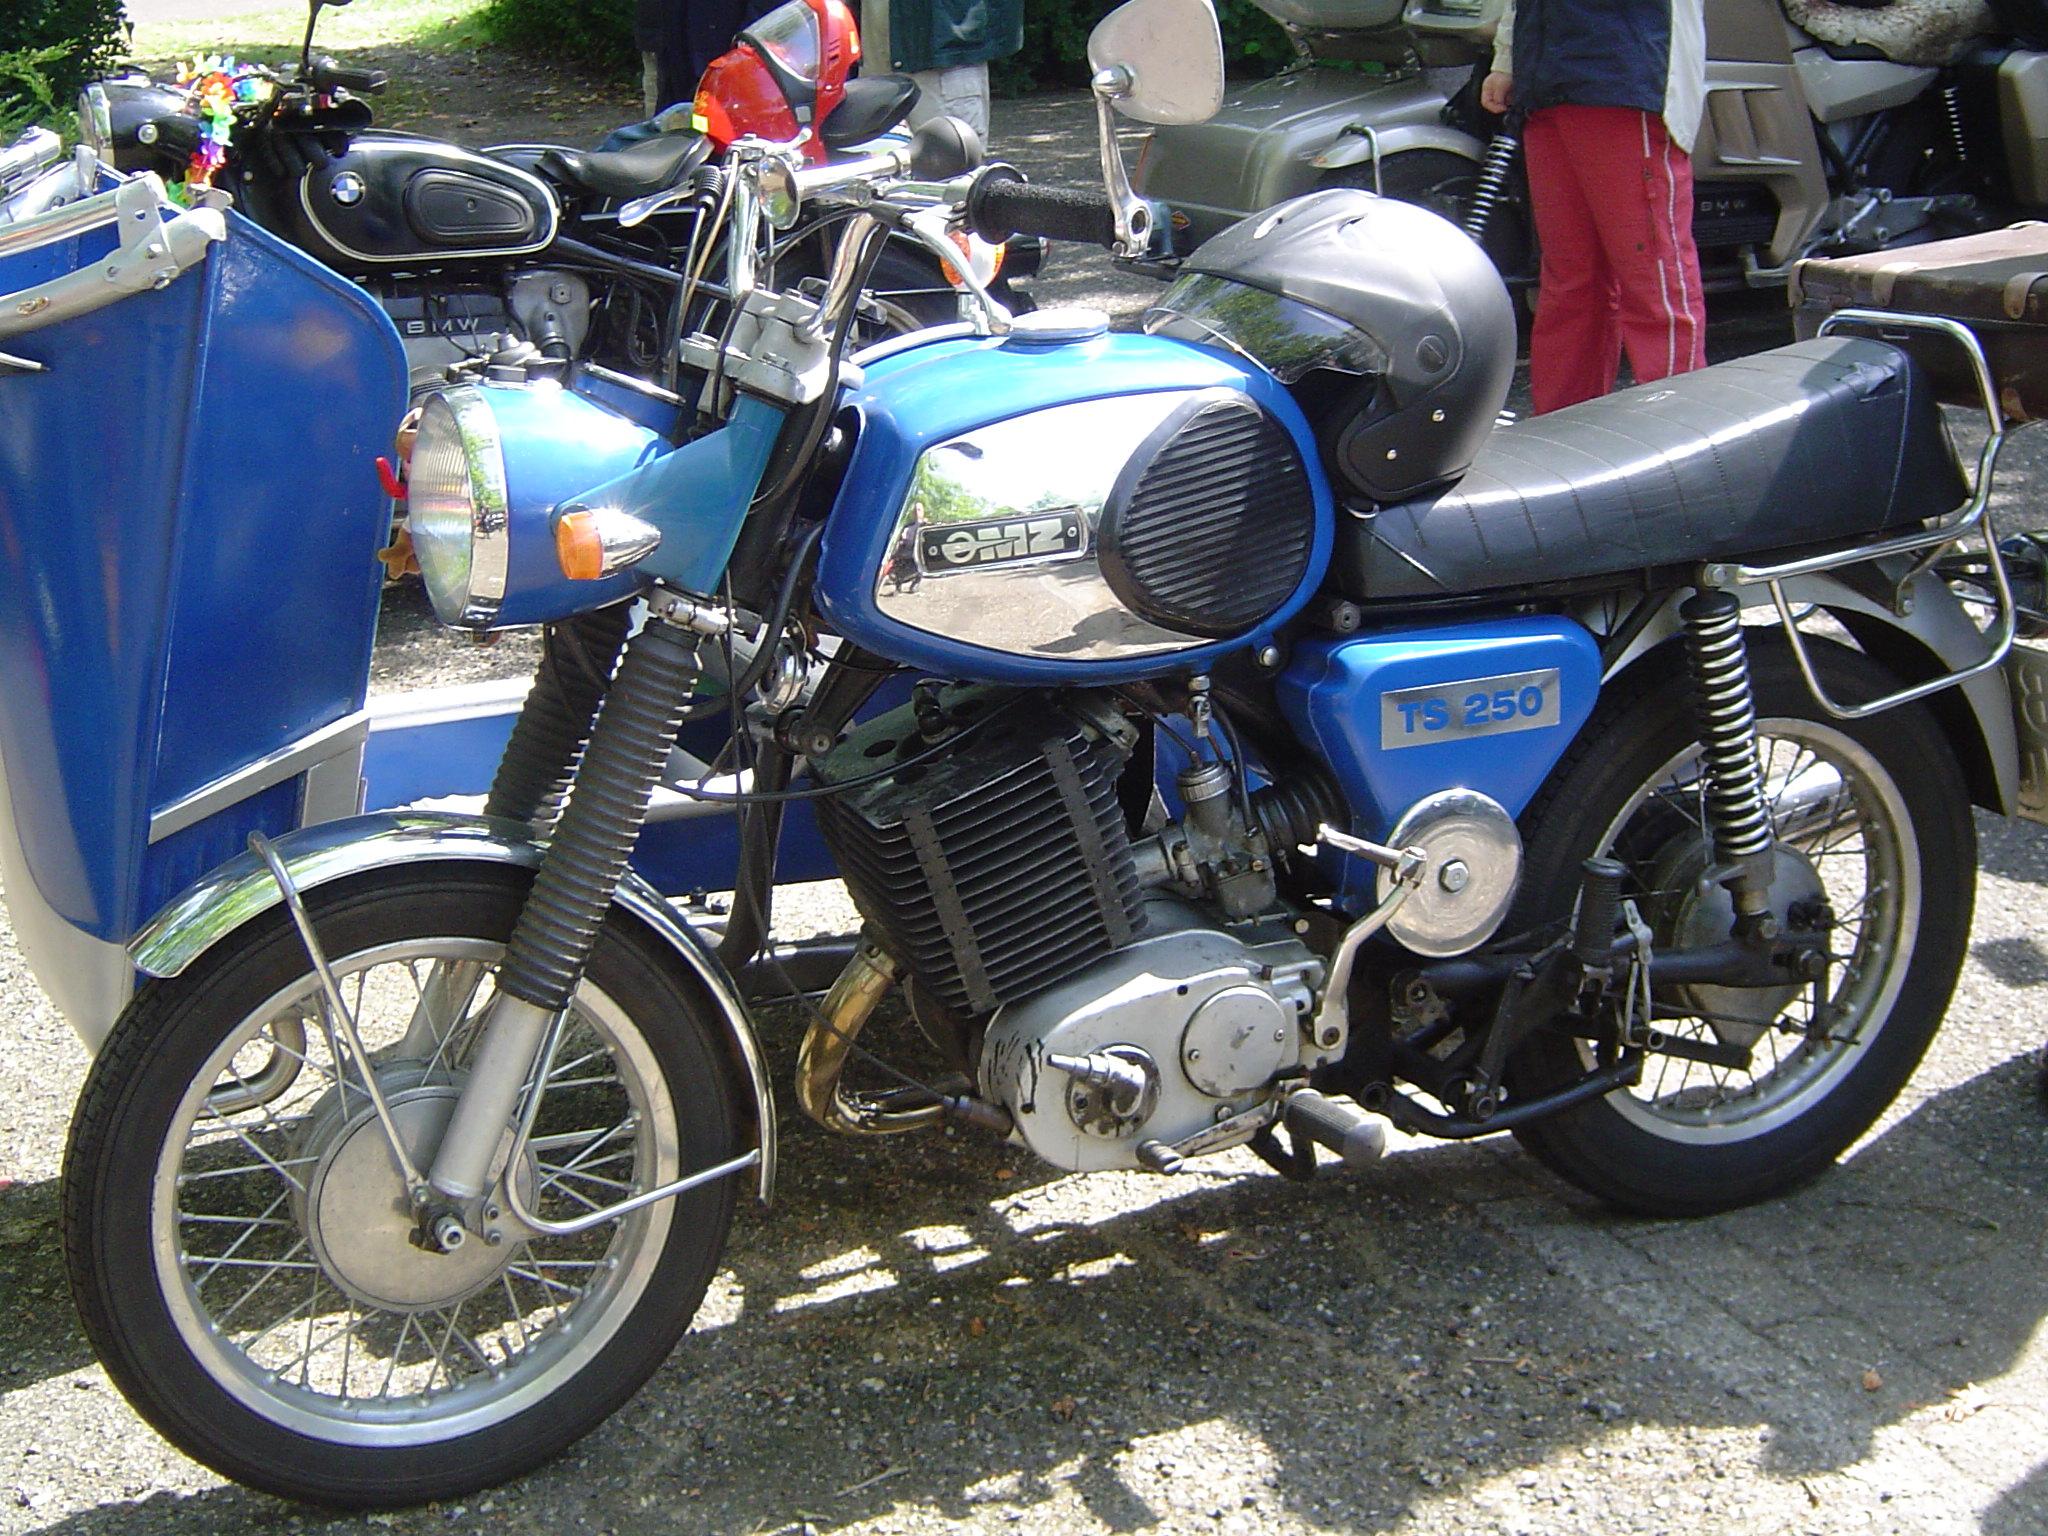 MZ 125 silver